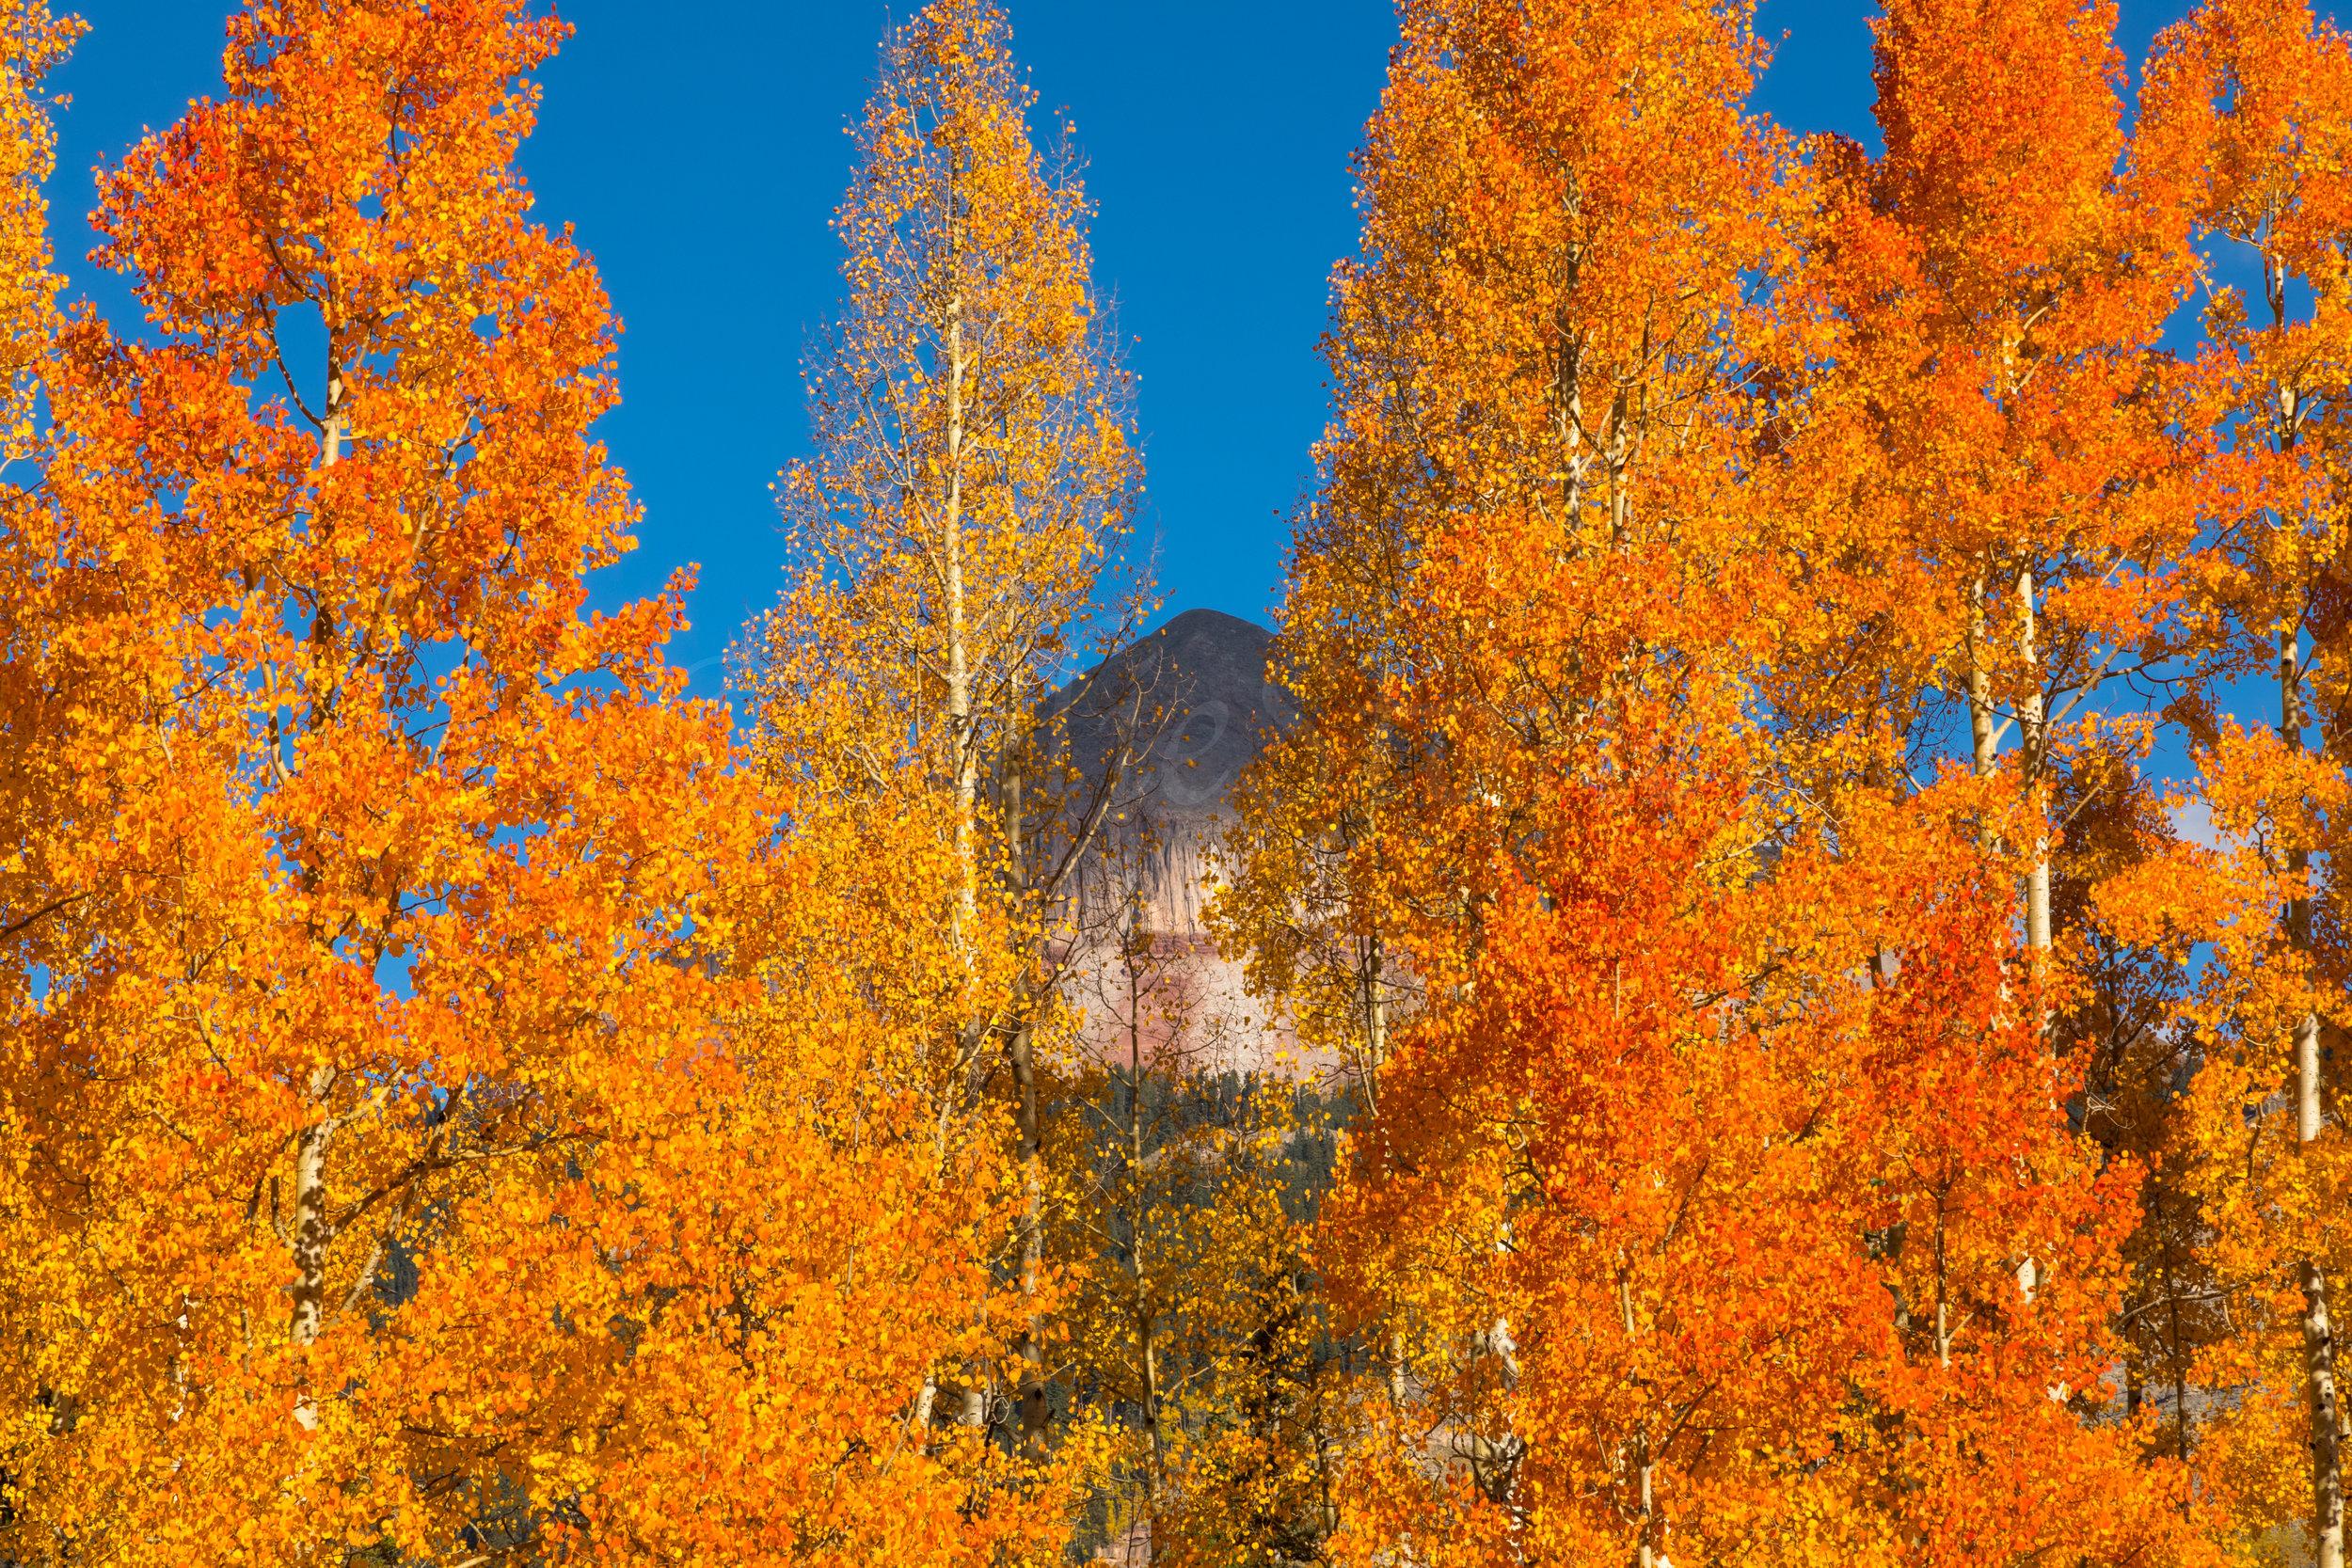 Engineer Mountain, Image # 3027